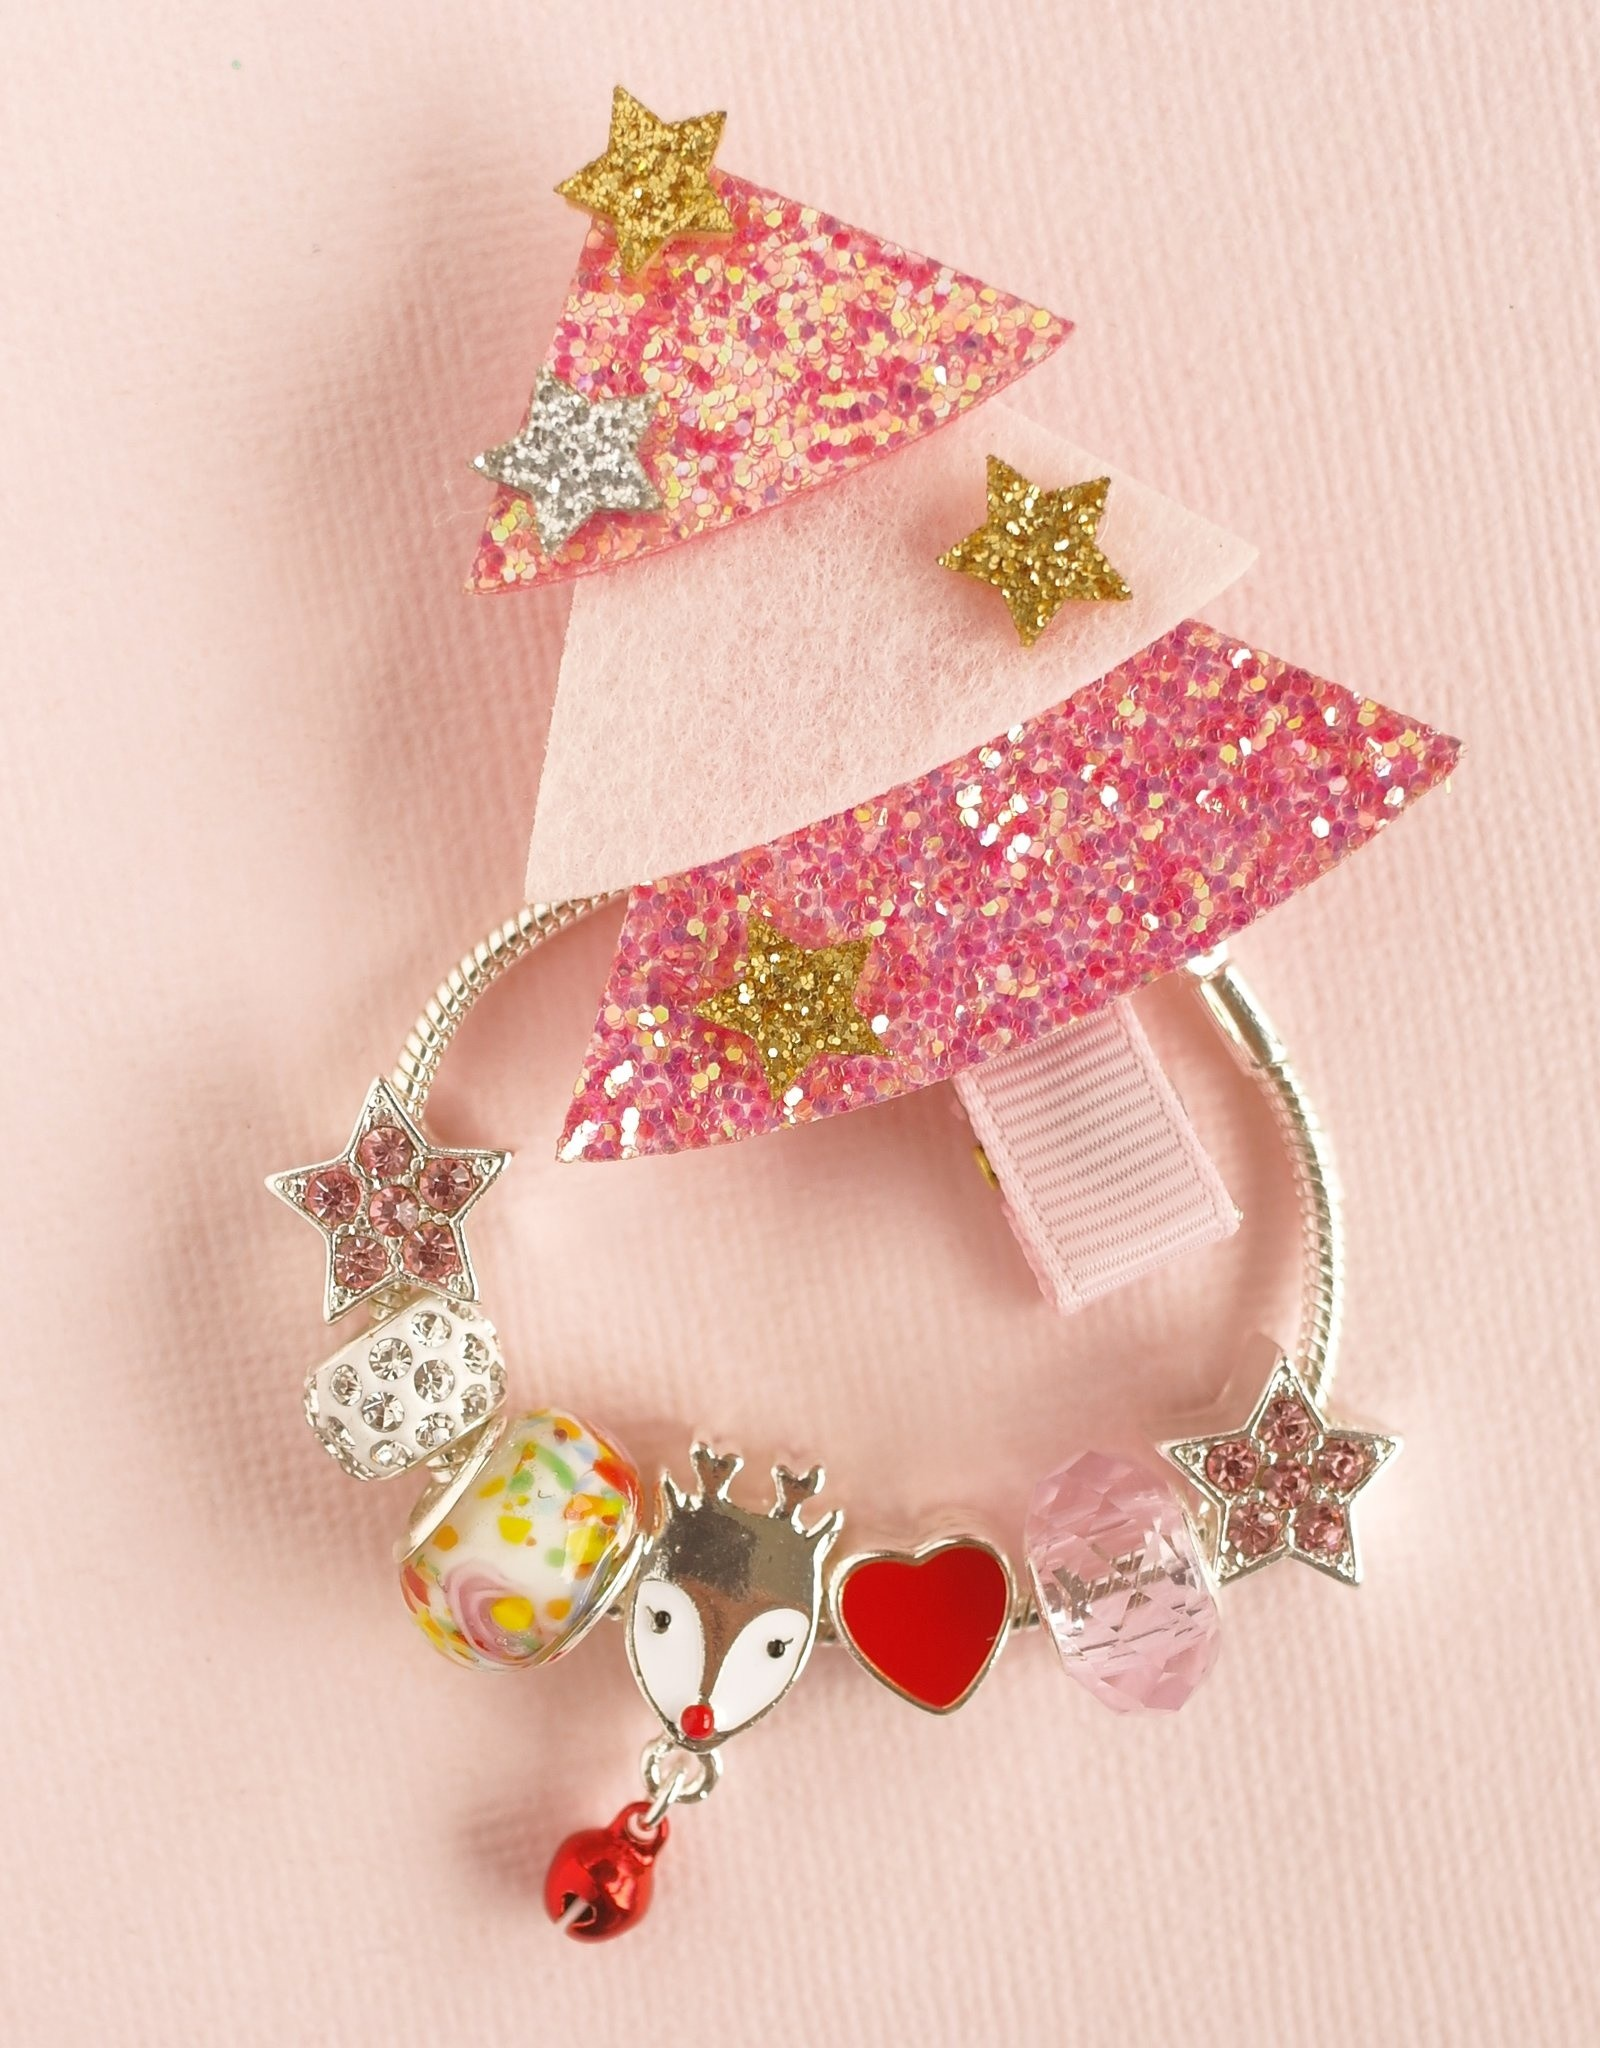 Lauren Hinkley Lauren Hinkley - Rudolph The Red Nosed Reindeer Christmas Charm Bracelet